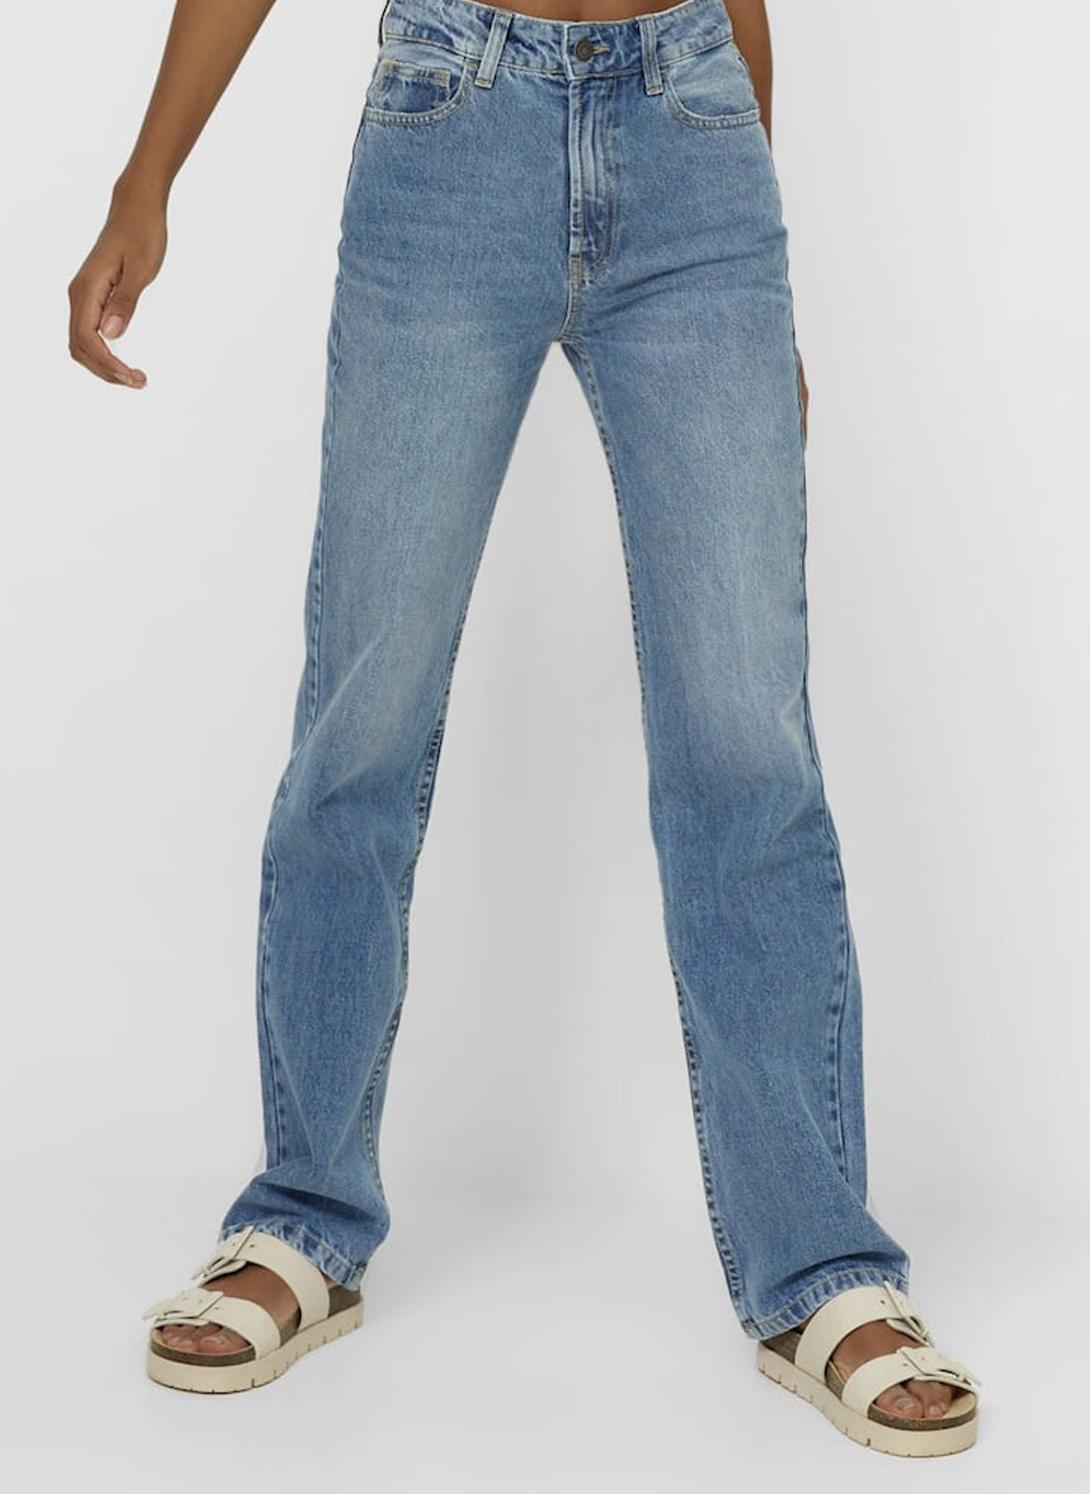 striaght fit jeans woman